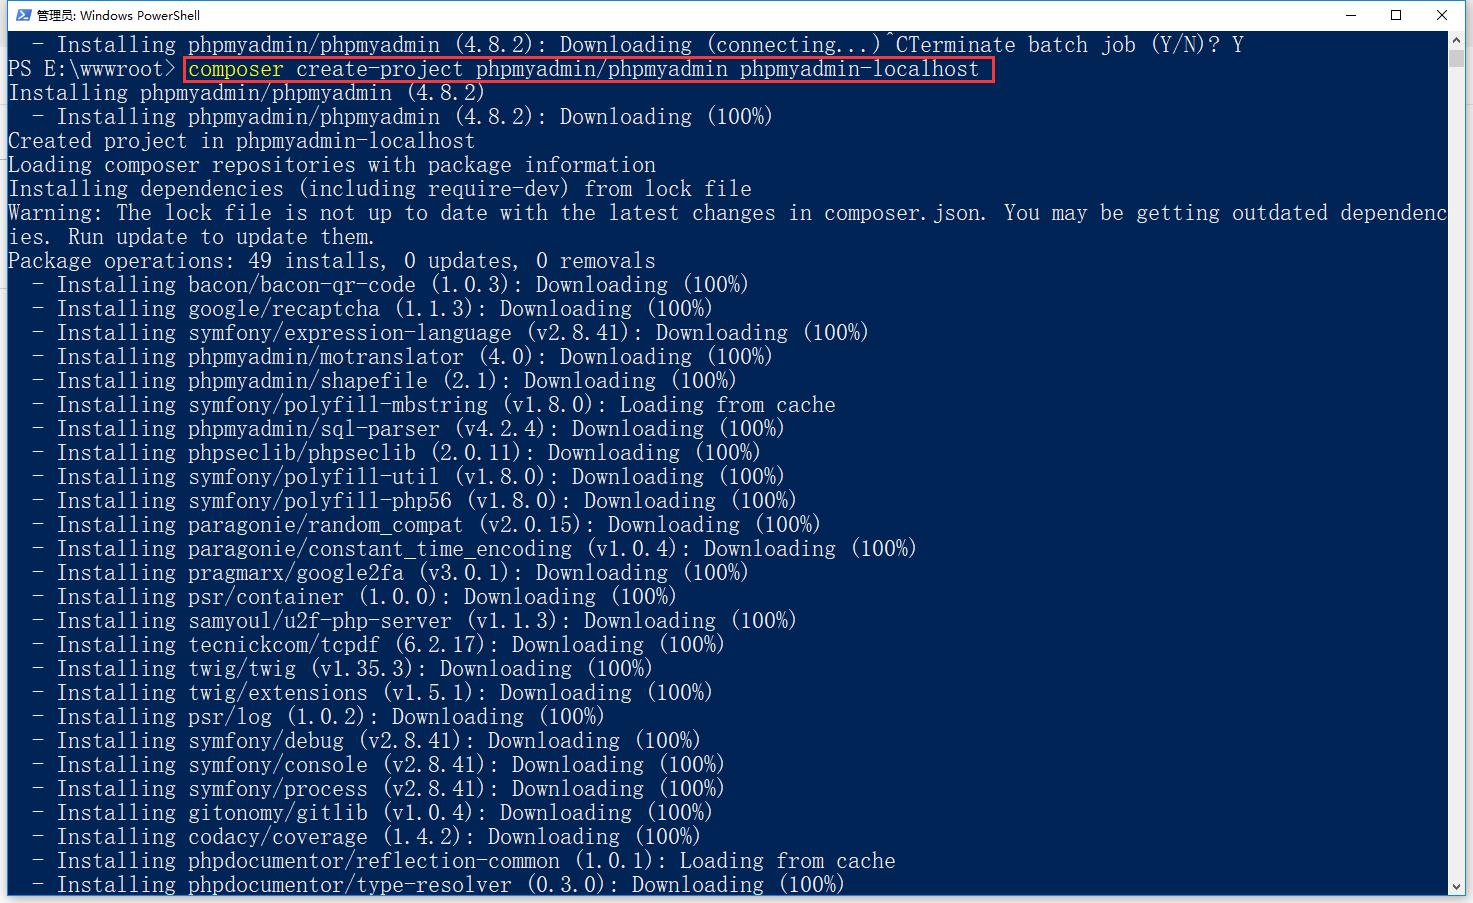 基于 Composer 安装,运行命令